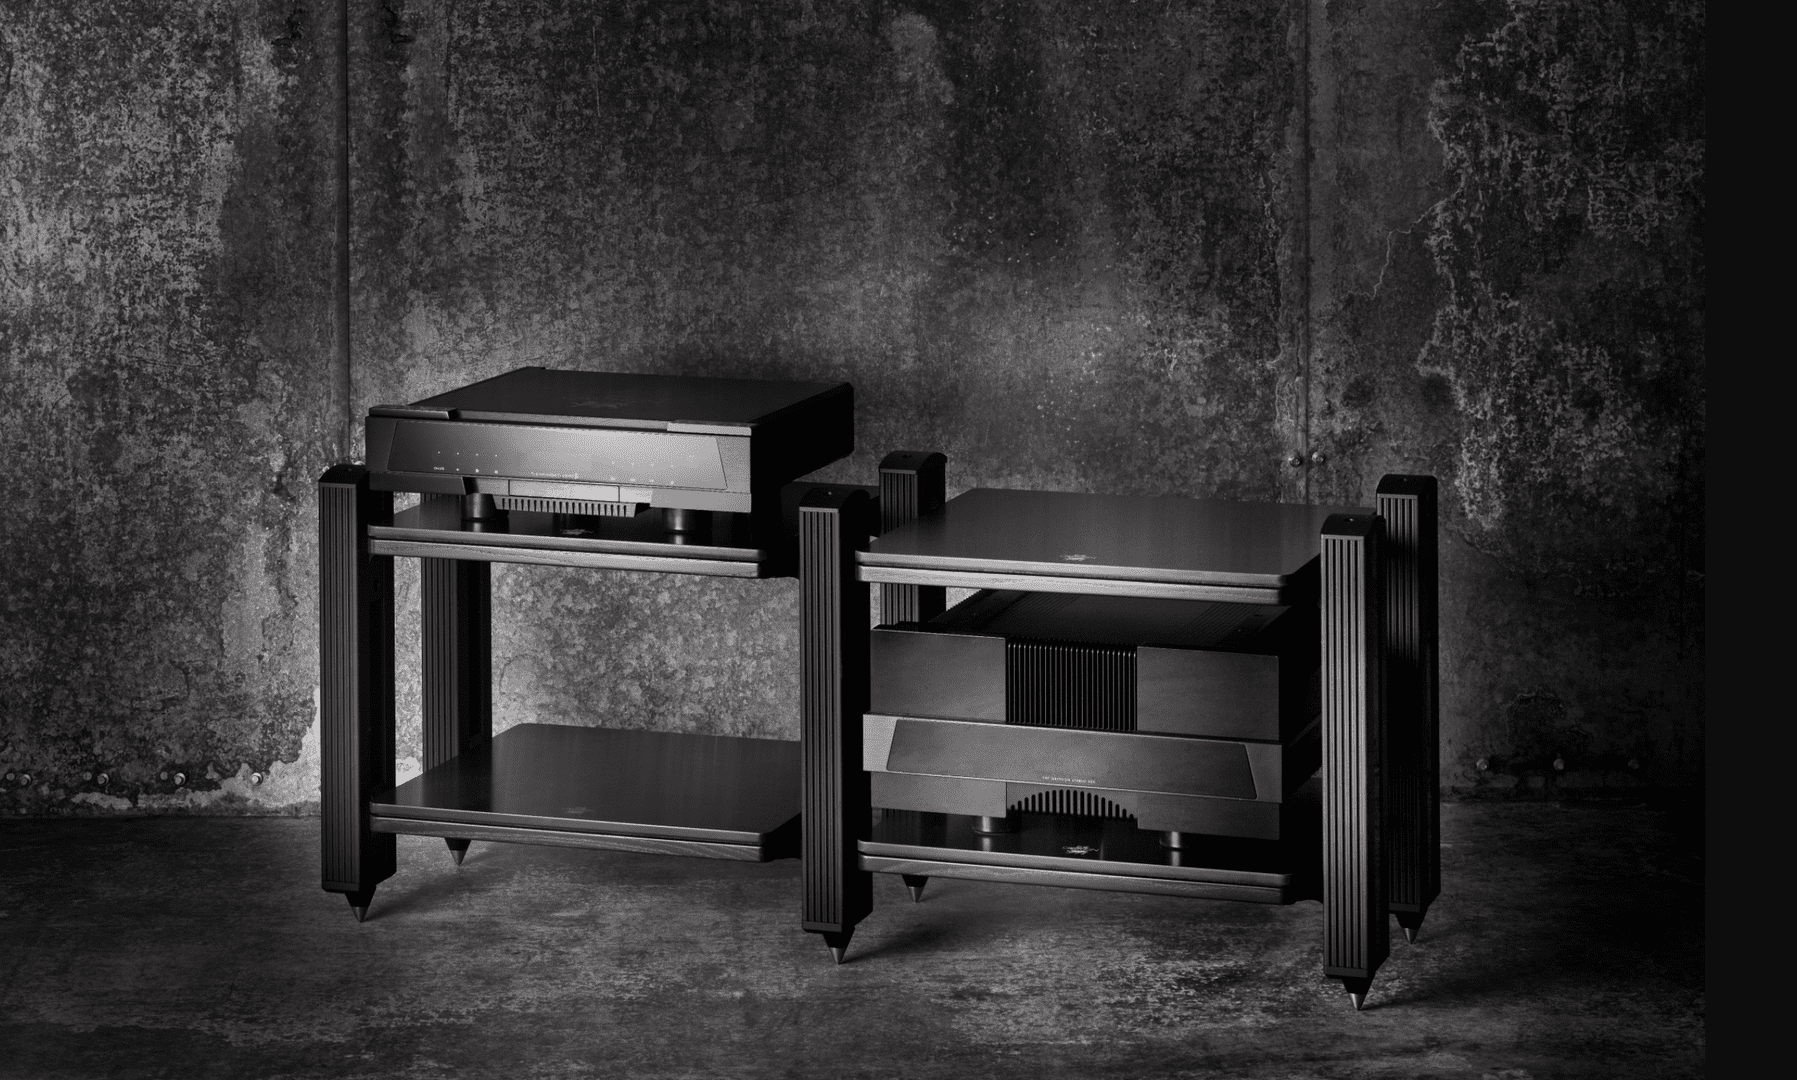 Gryphon Audio Introduces StandArt HiFi Furniture System